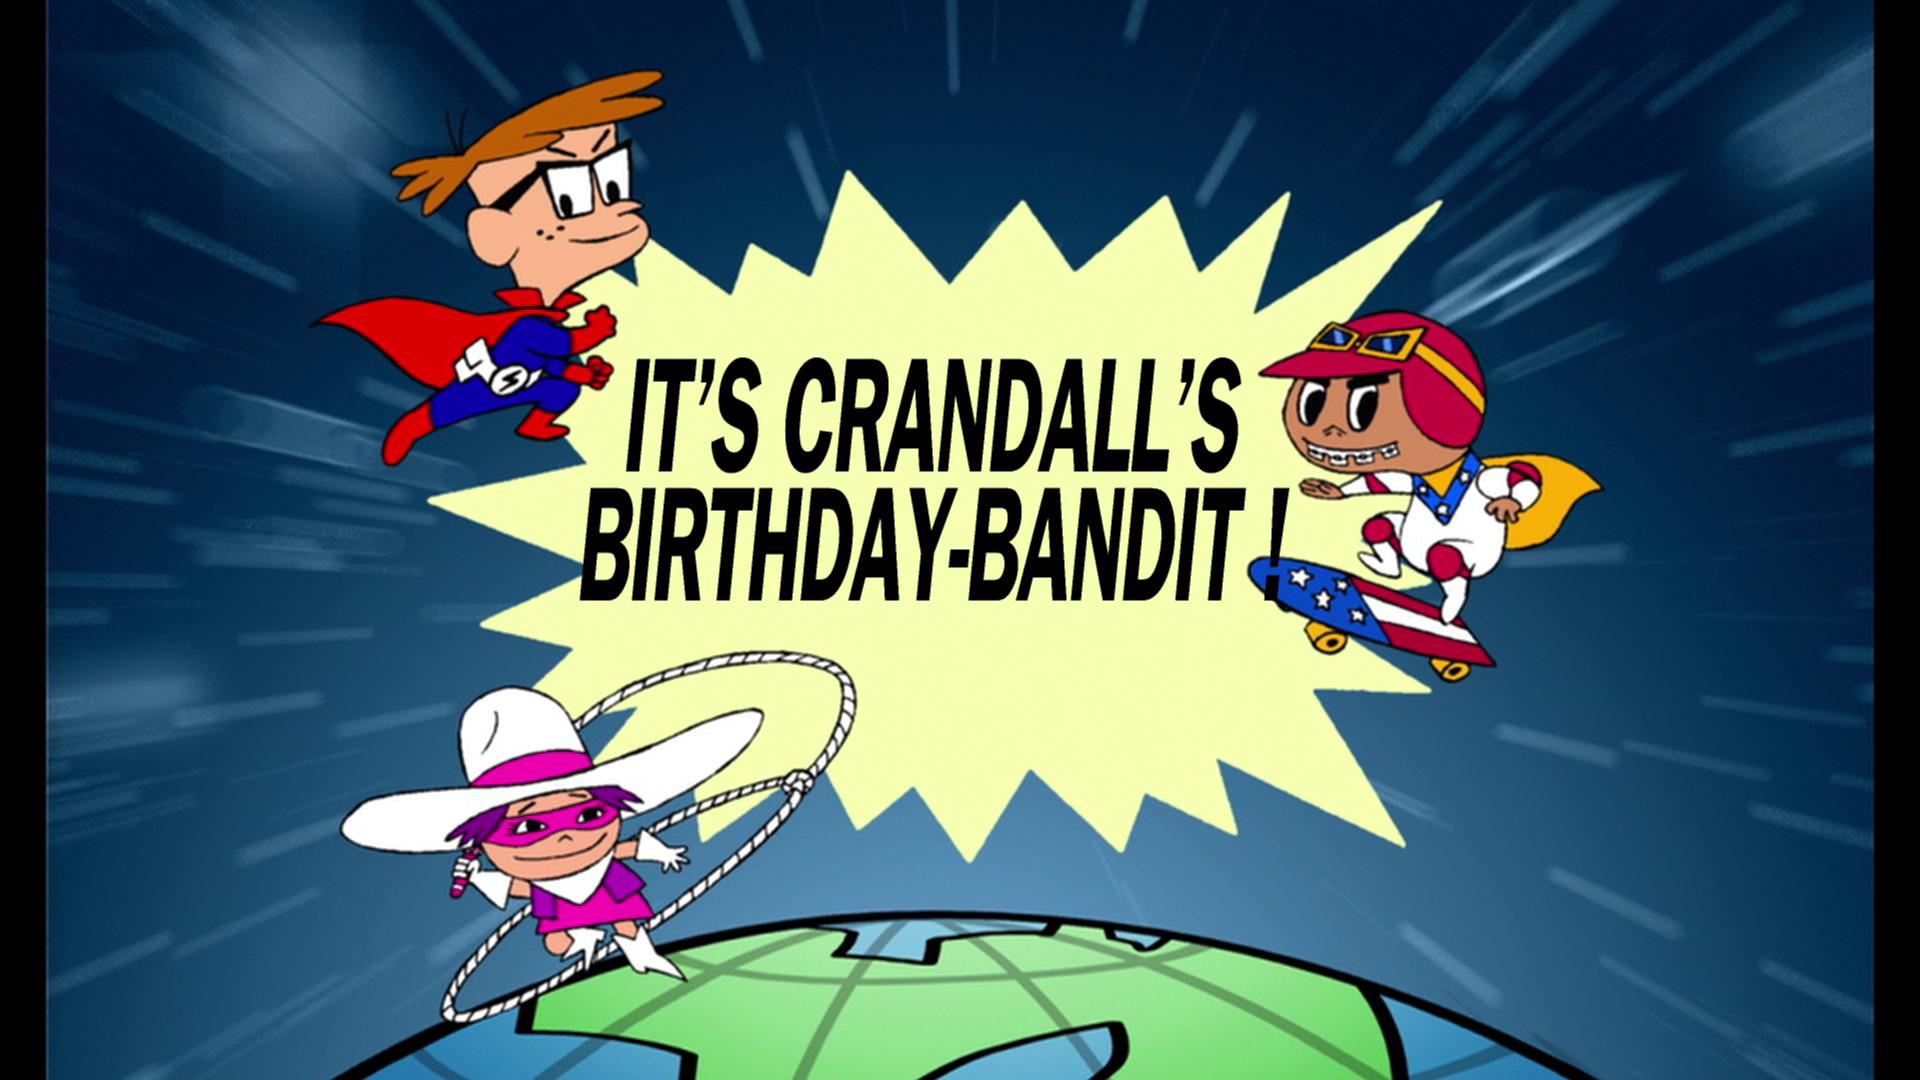 It's Crandall's Birthday - Bandit!